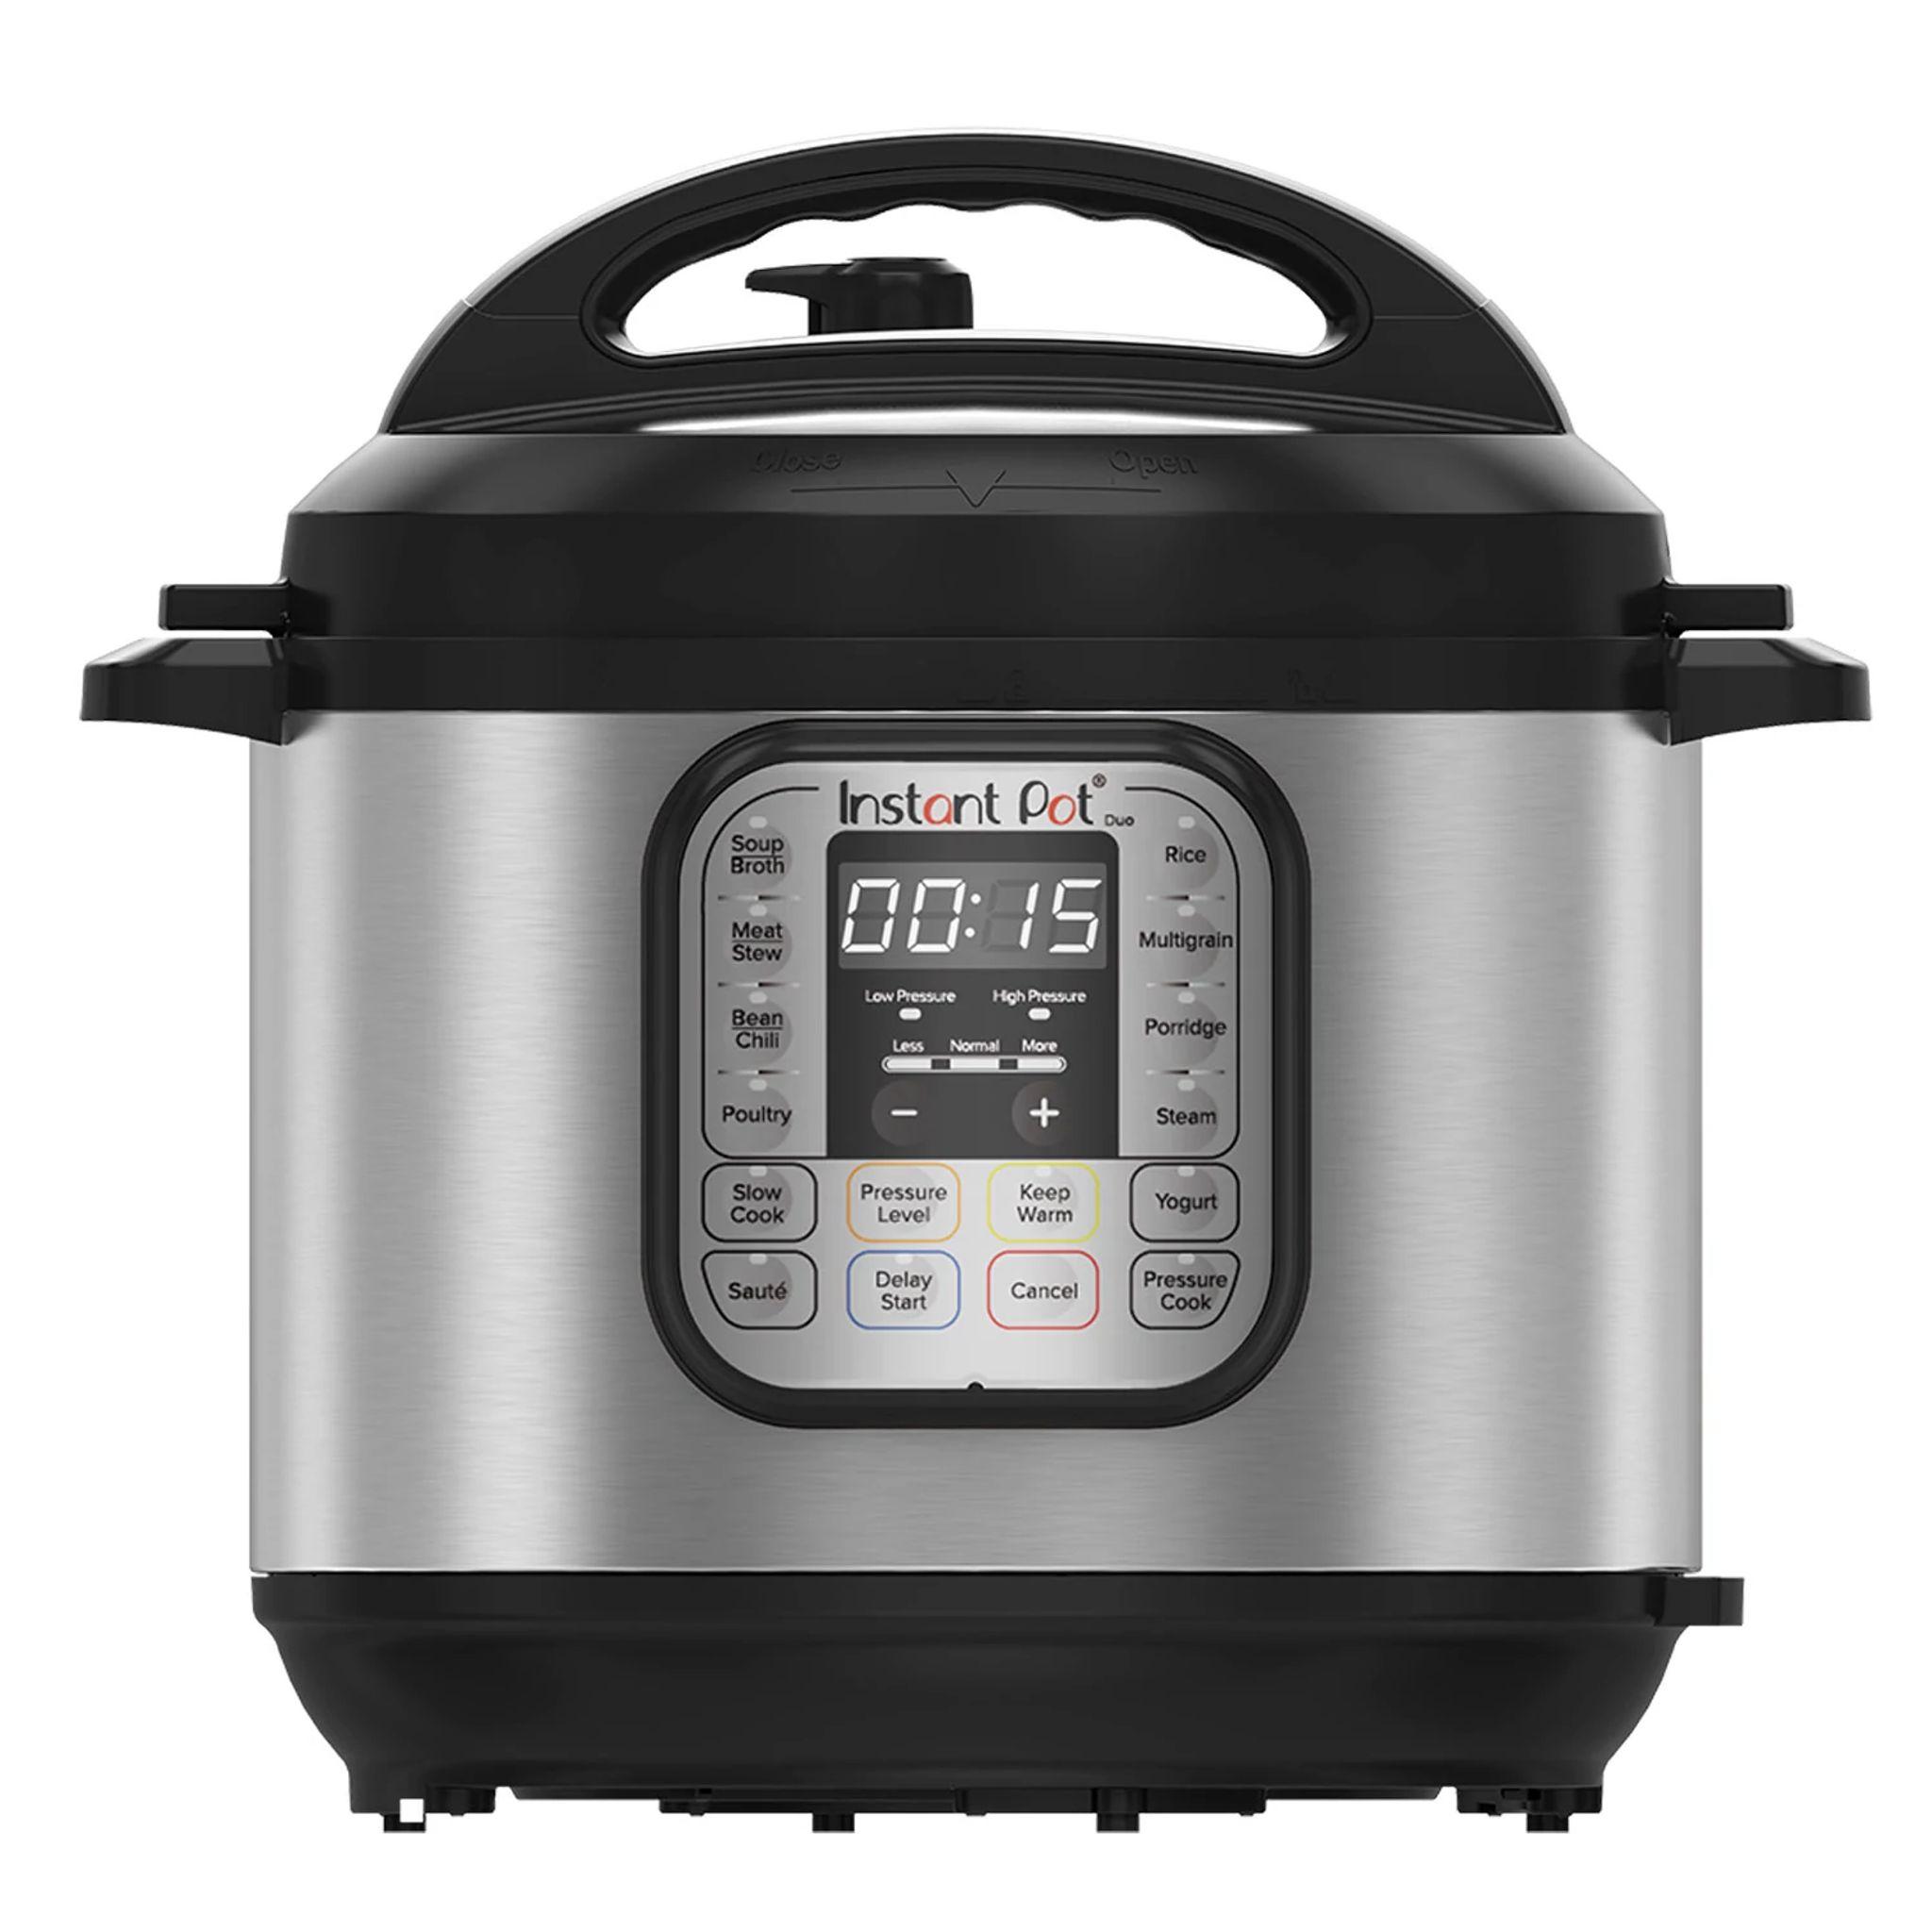 Instant Pot Duo 3-quart Mini Multi-Use Pressure Cooker